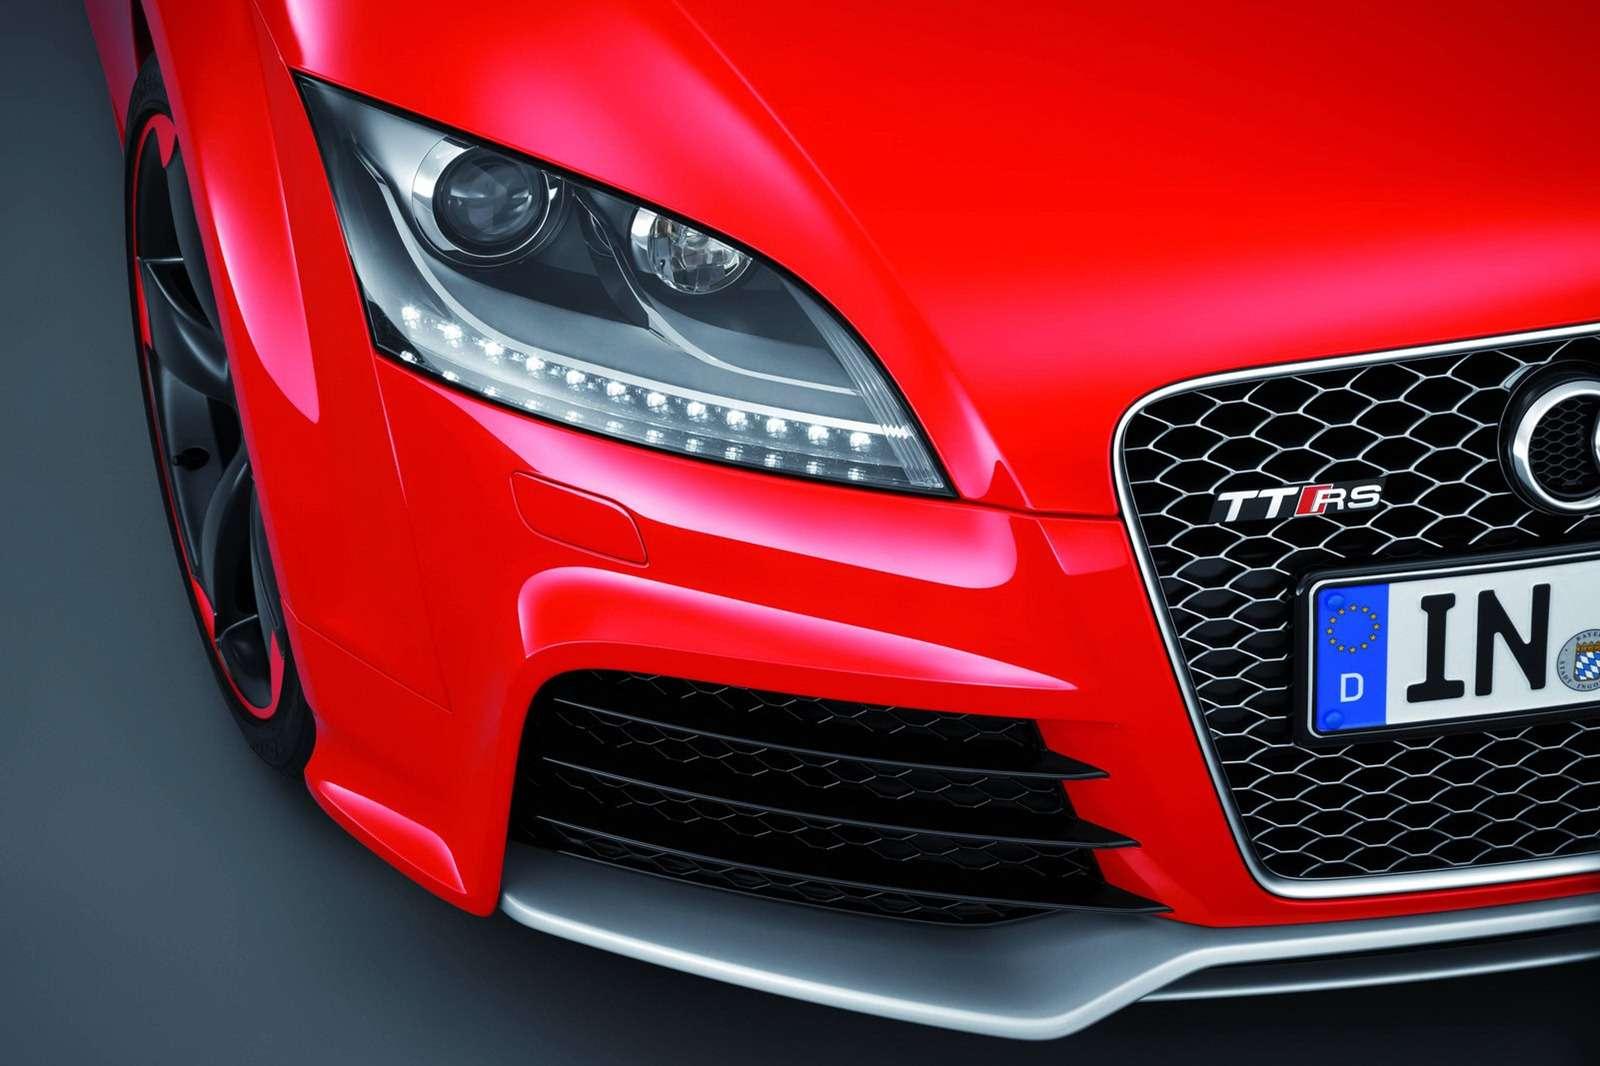 Nowe Audi TT RS Plus Coupe i Roadster oficjalnie luty 2012